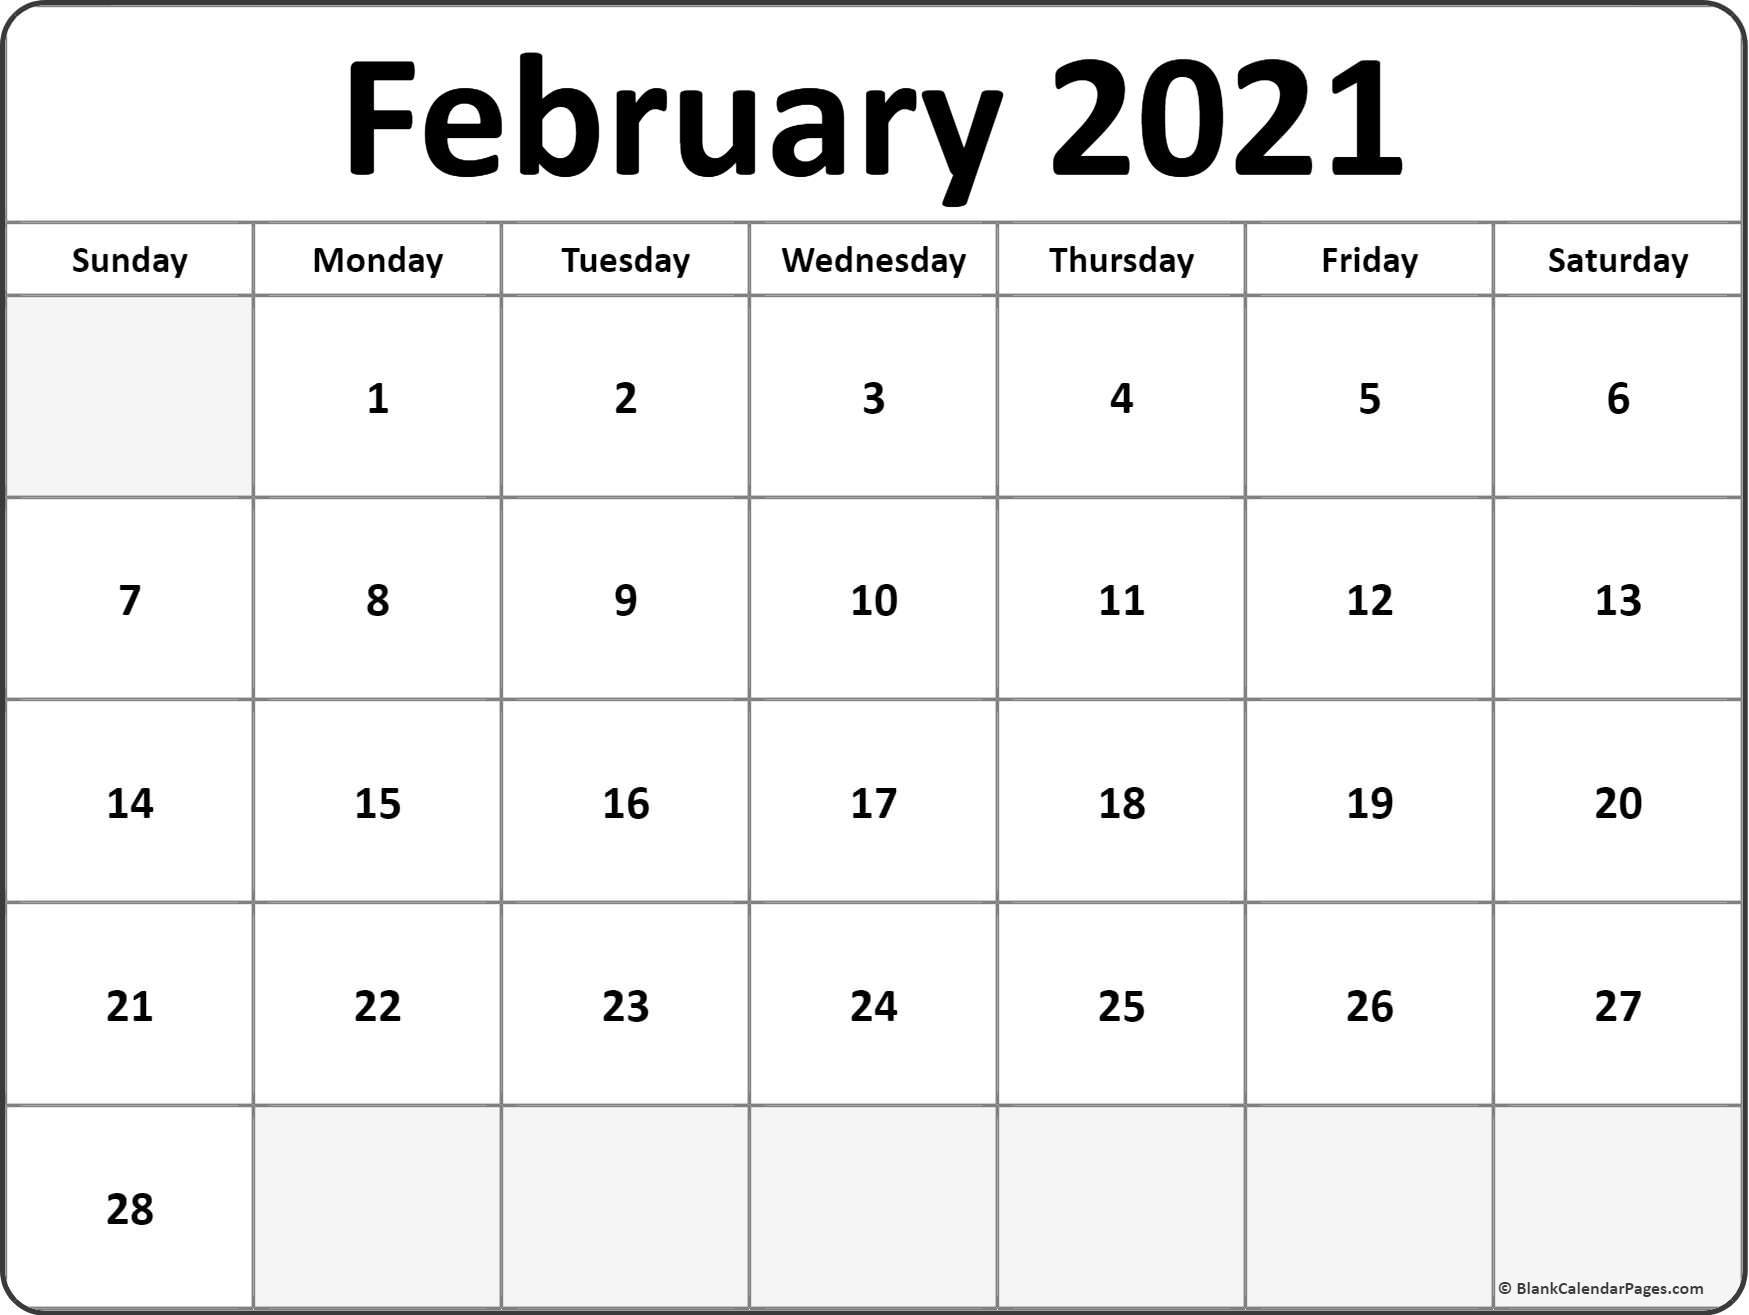 February 2021 Calendar Free Printable Monthly Calendars